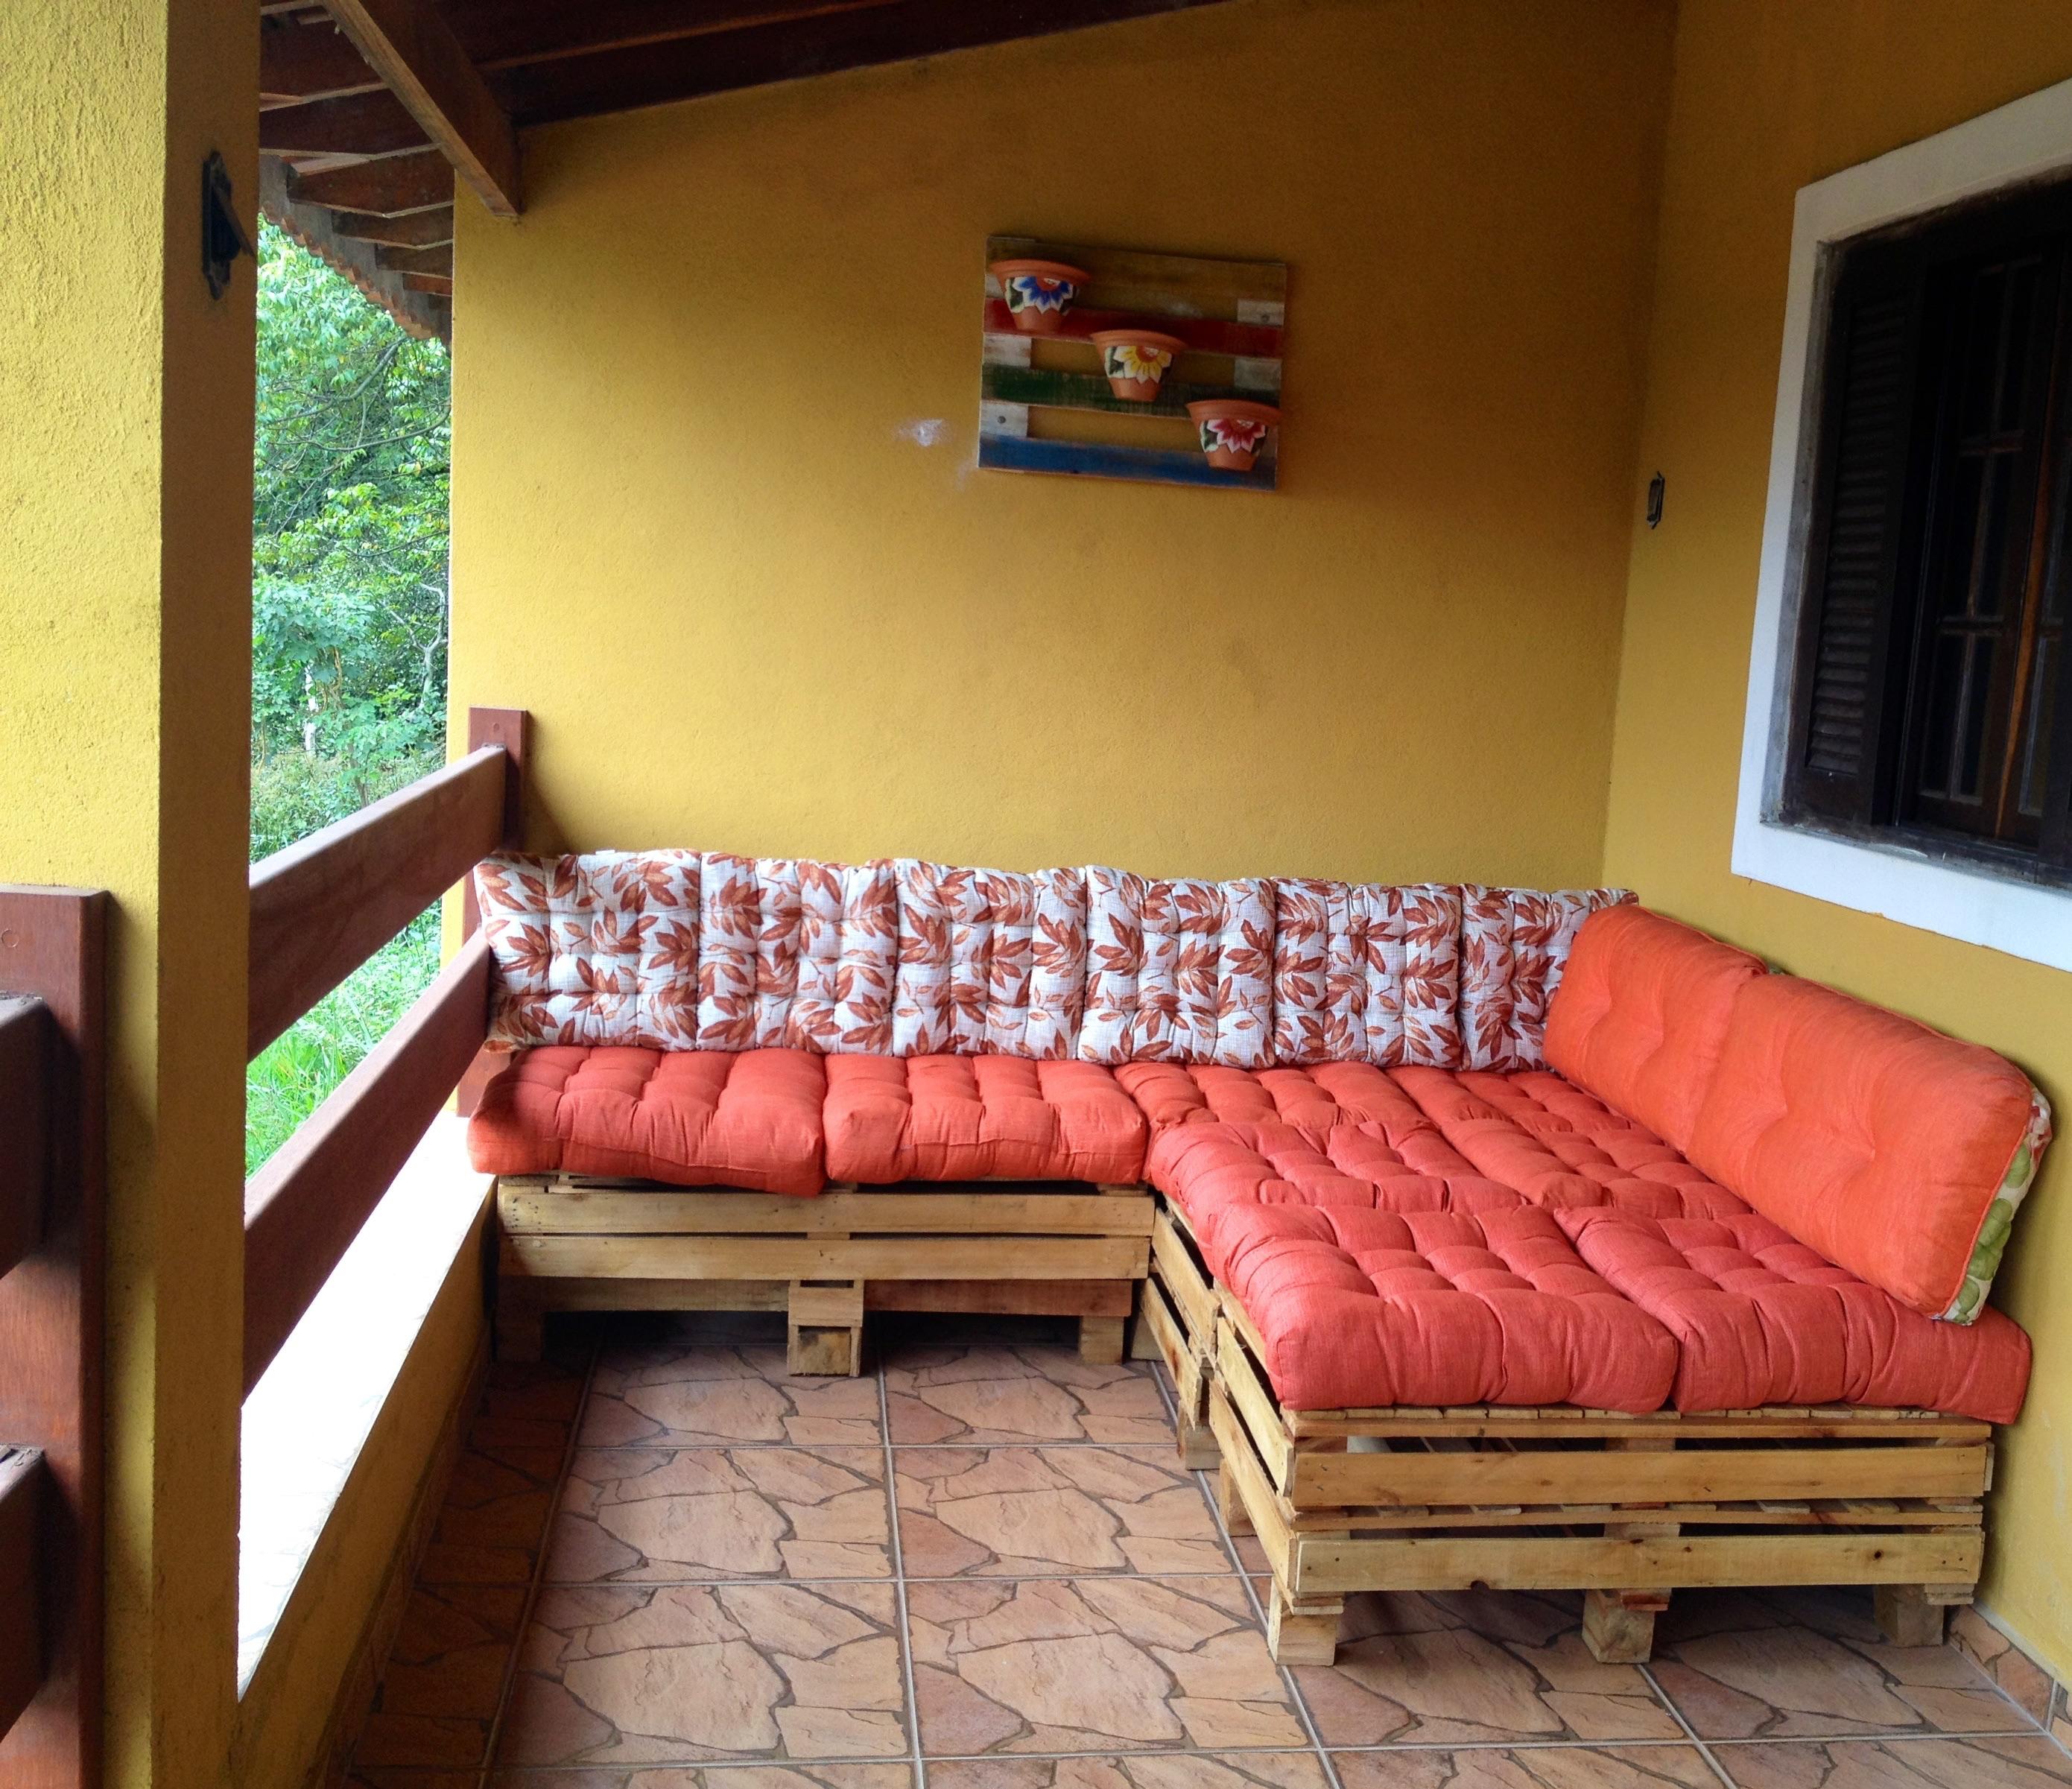 Diy sofa pallet ceria dengan kusyen merah